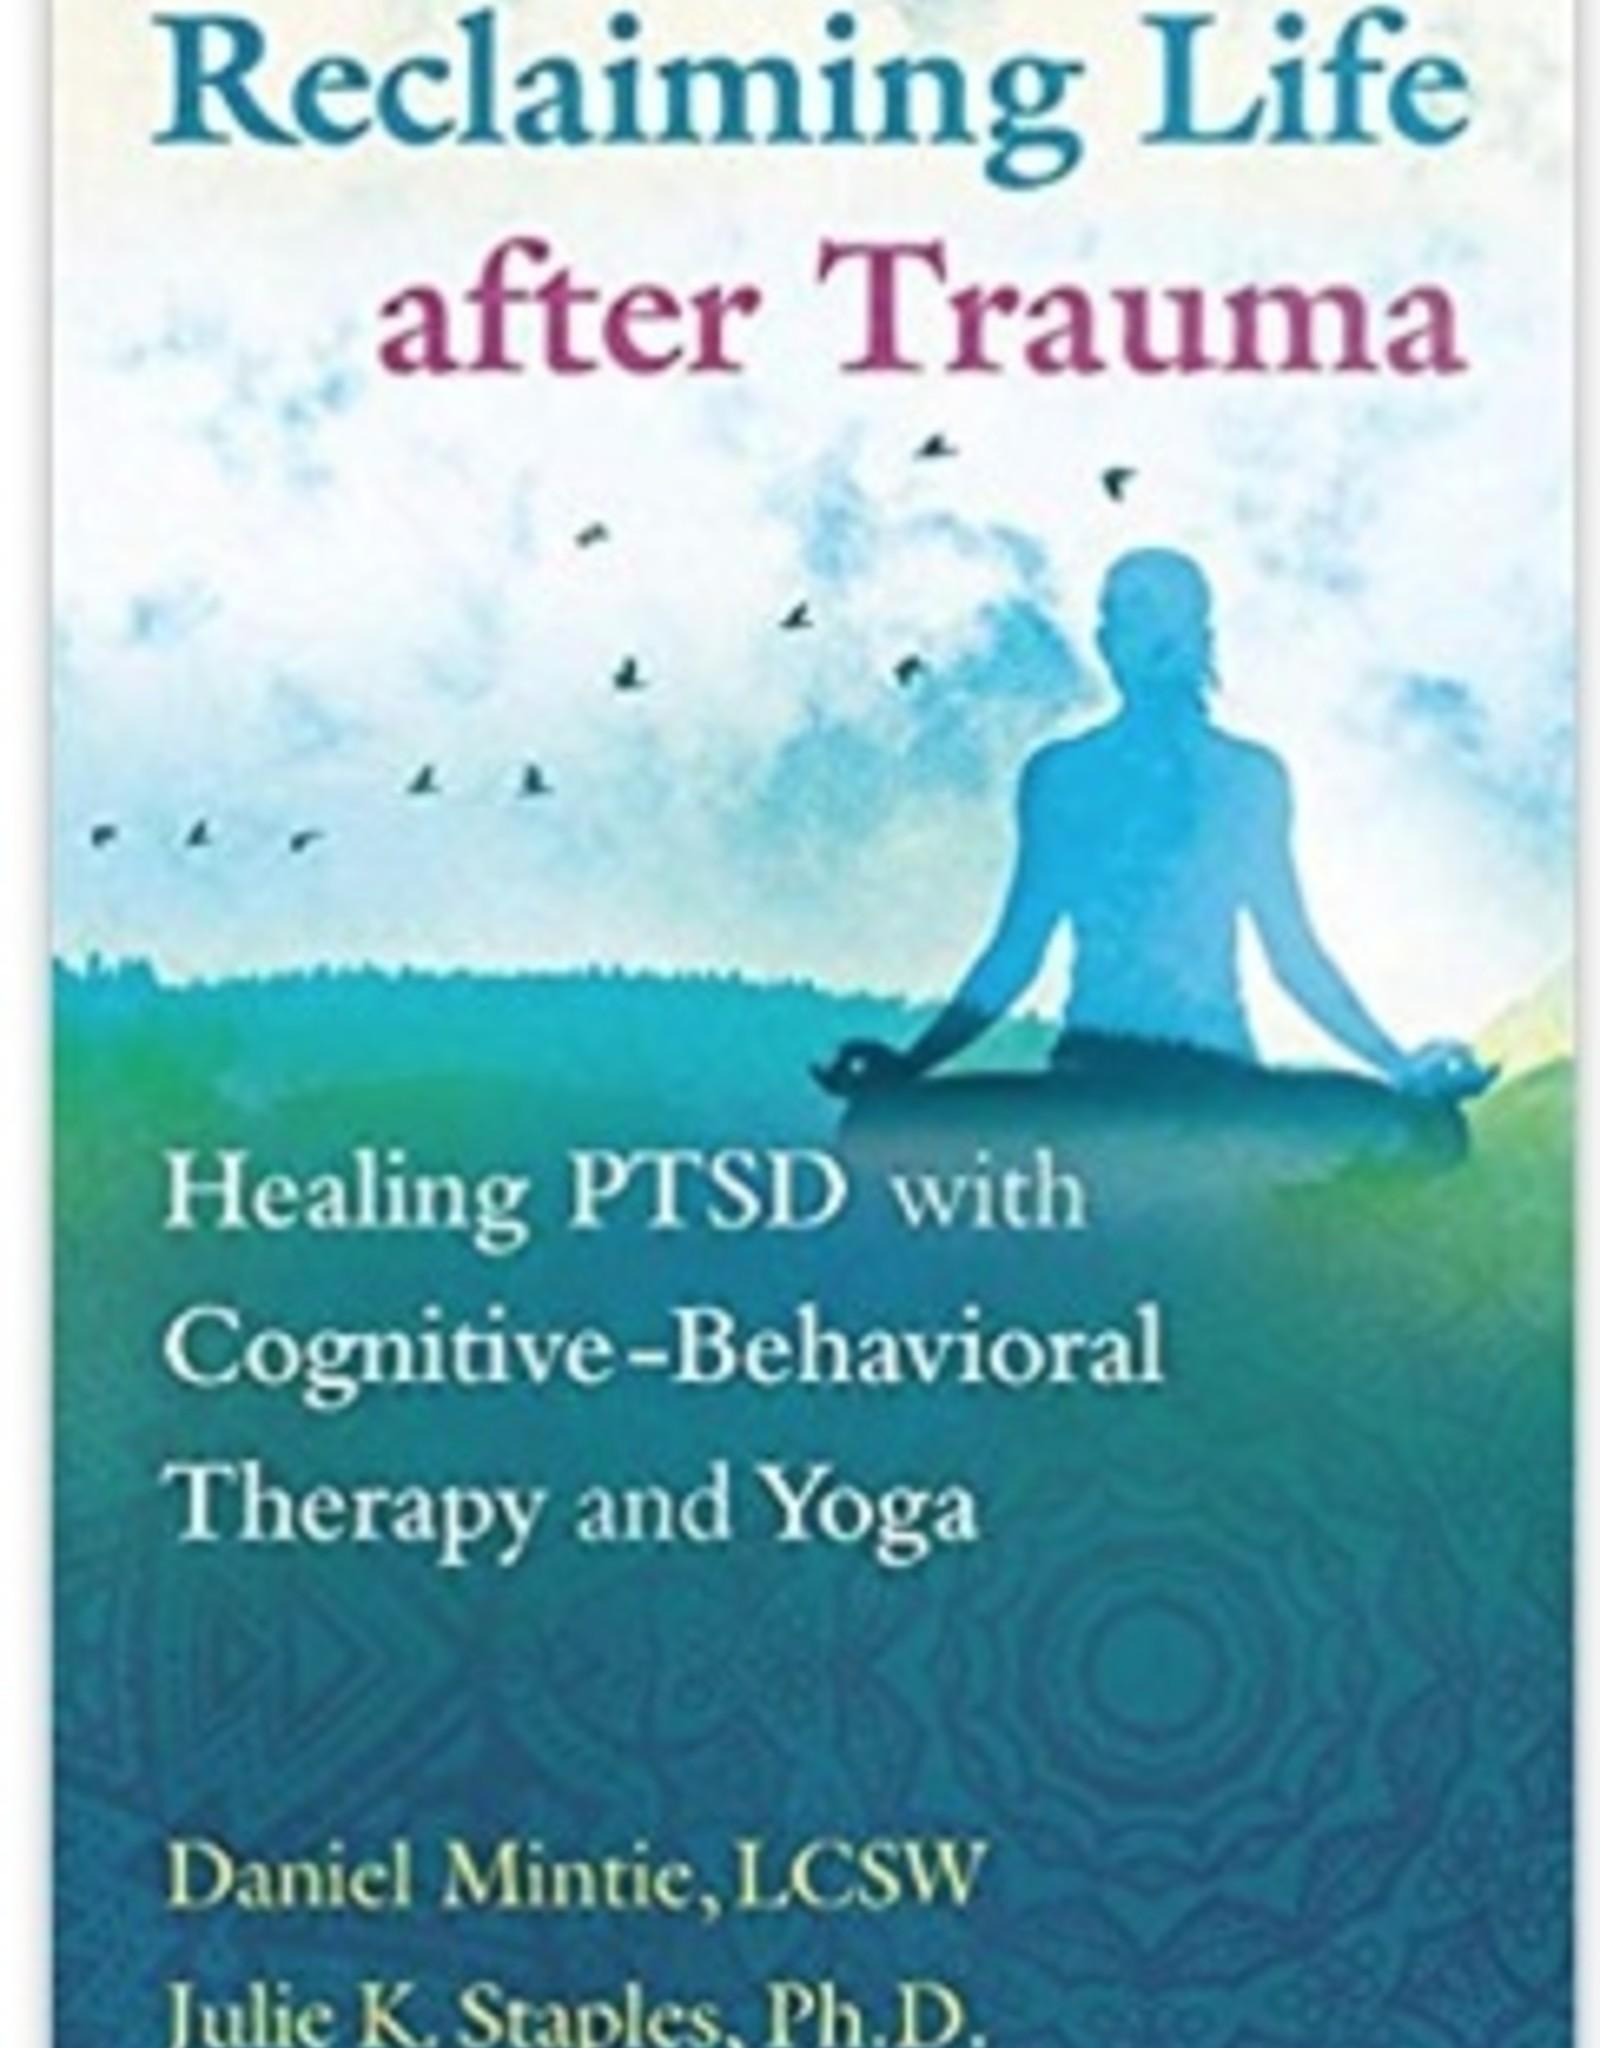 Integral Yoga Distribution Reclaiming Life After Trauma